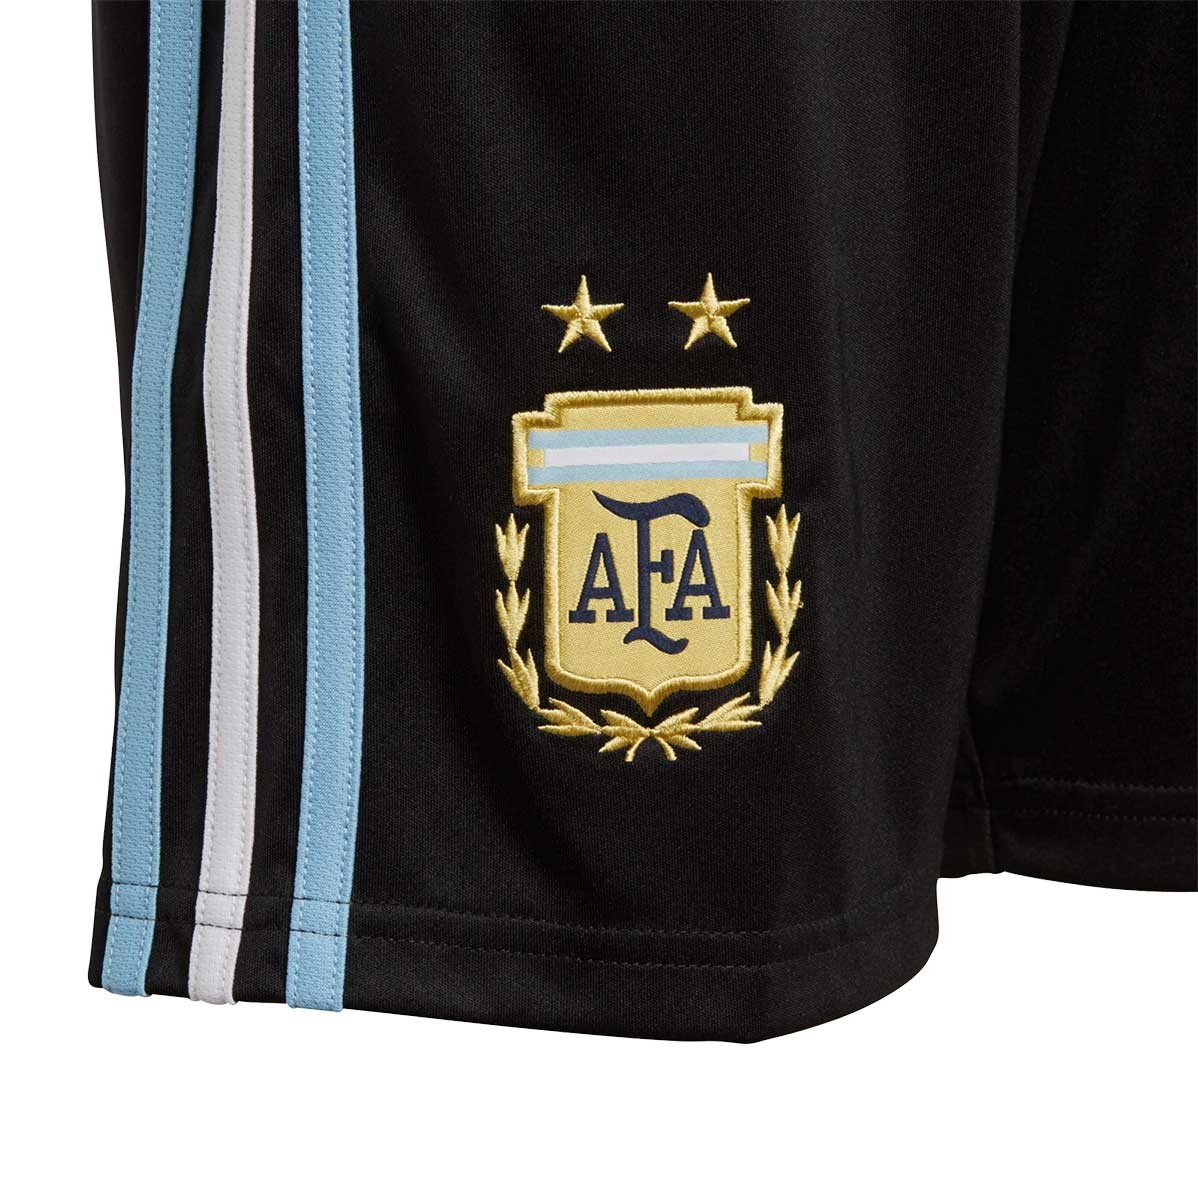 94b47d8f8 Shorts adidas Kids Argentina 2017-2018 Home Black-Clear blue-White - Tienda  de fútbol Fútbol Emotion